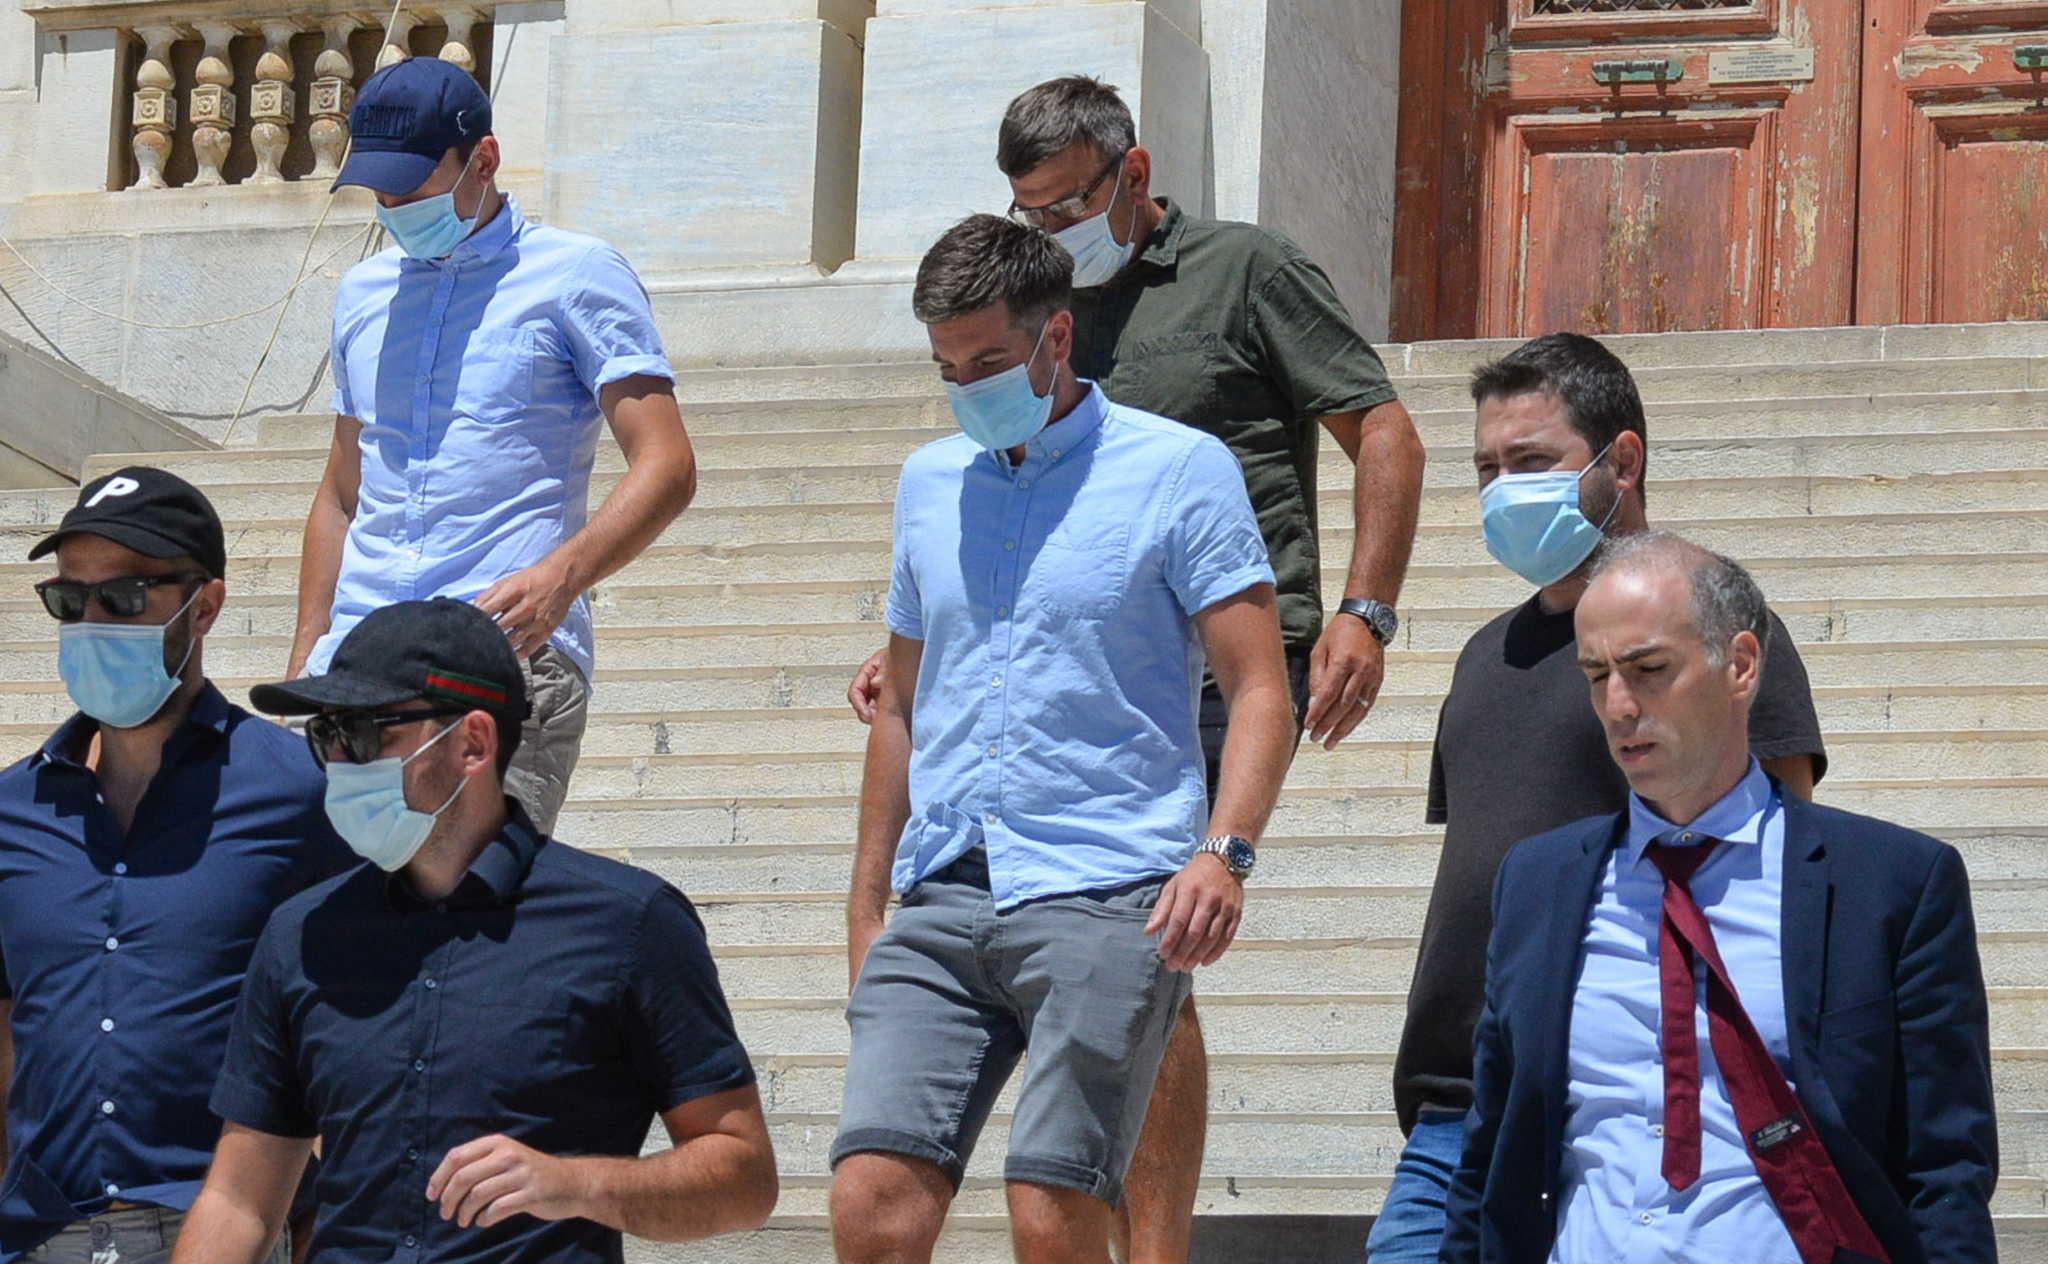 O Μαγκουάιρ ξόδεψε 70.000 ευρώ σε 5 ώρες σε αστακούς και σαμπάνιες πριν από το επεισόδιο